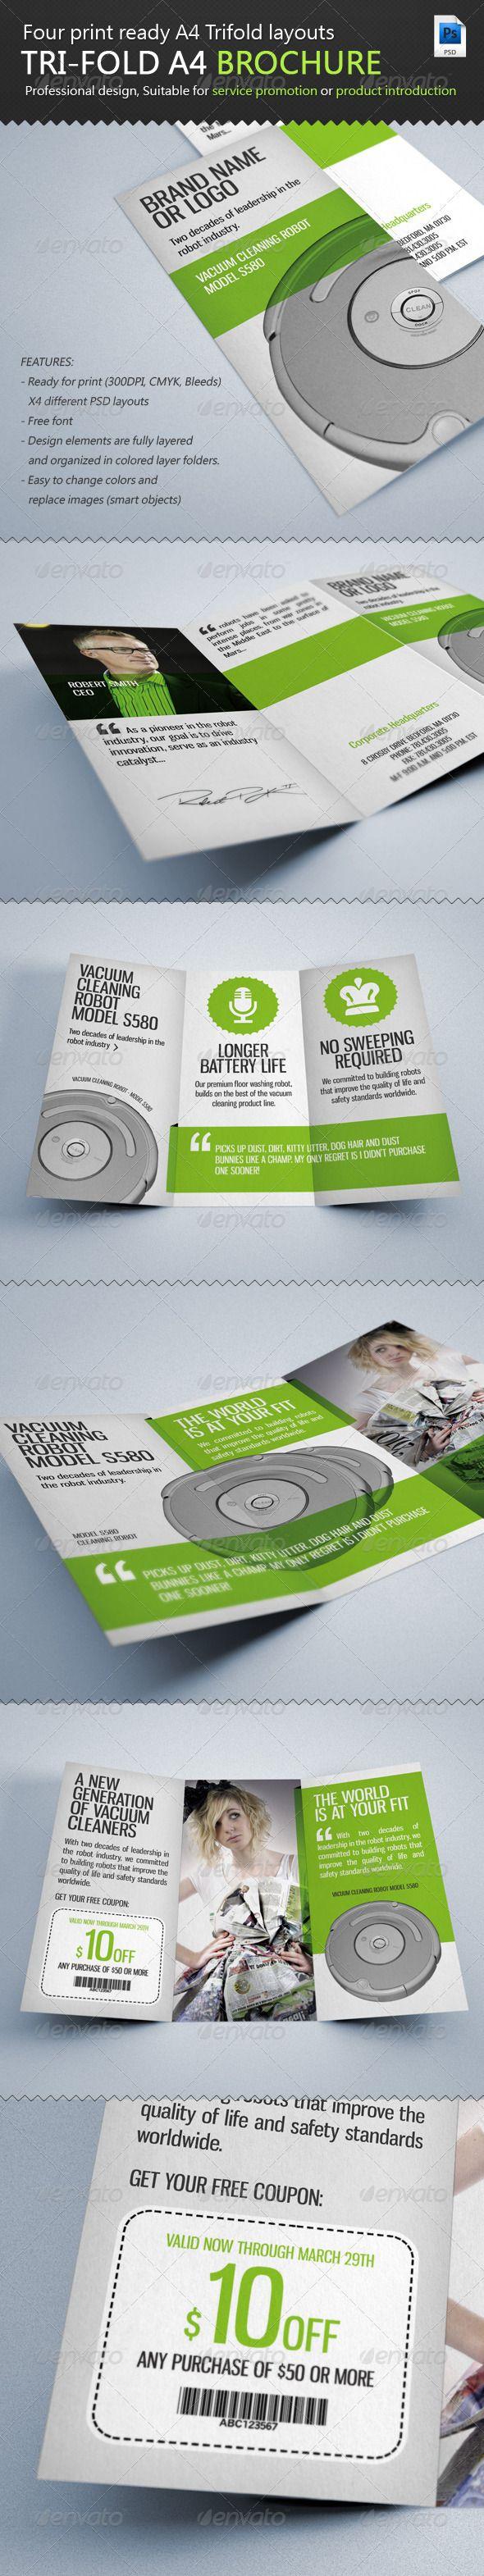 Best Informational Brochure Images On Pinterest Print - A4 tri fold brochure template